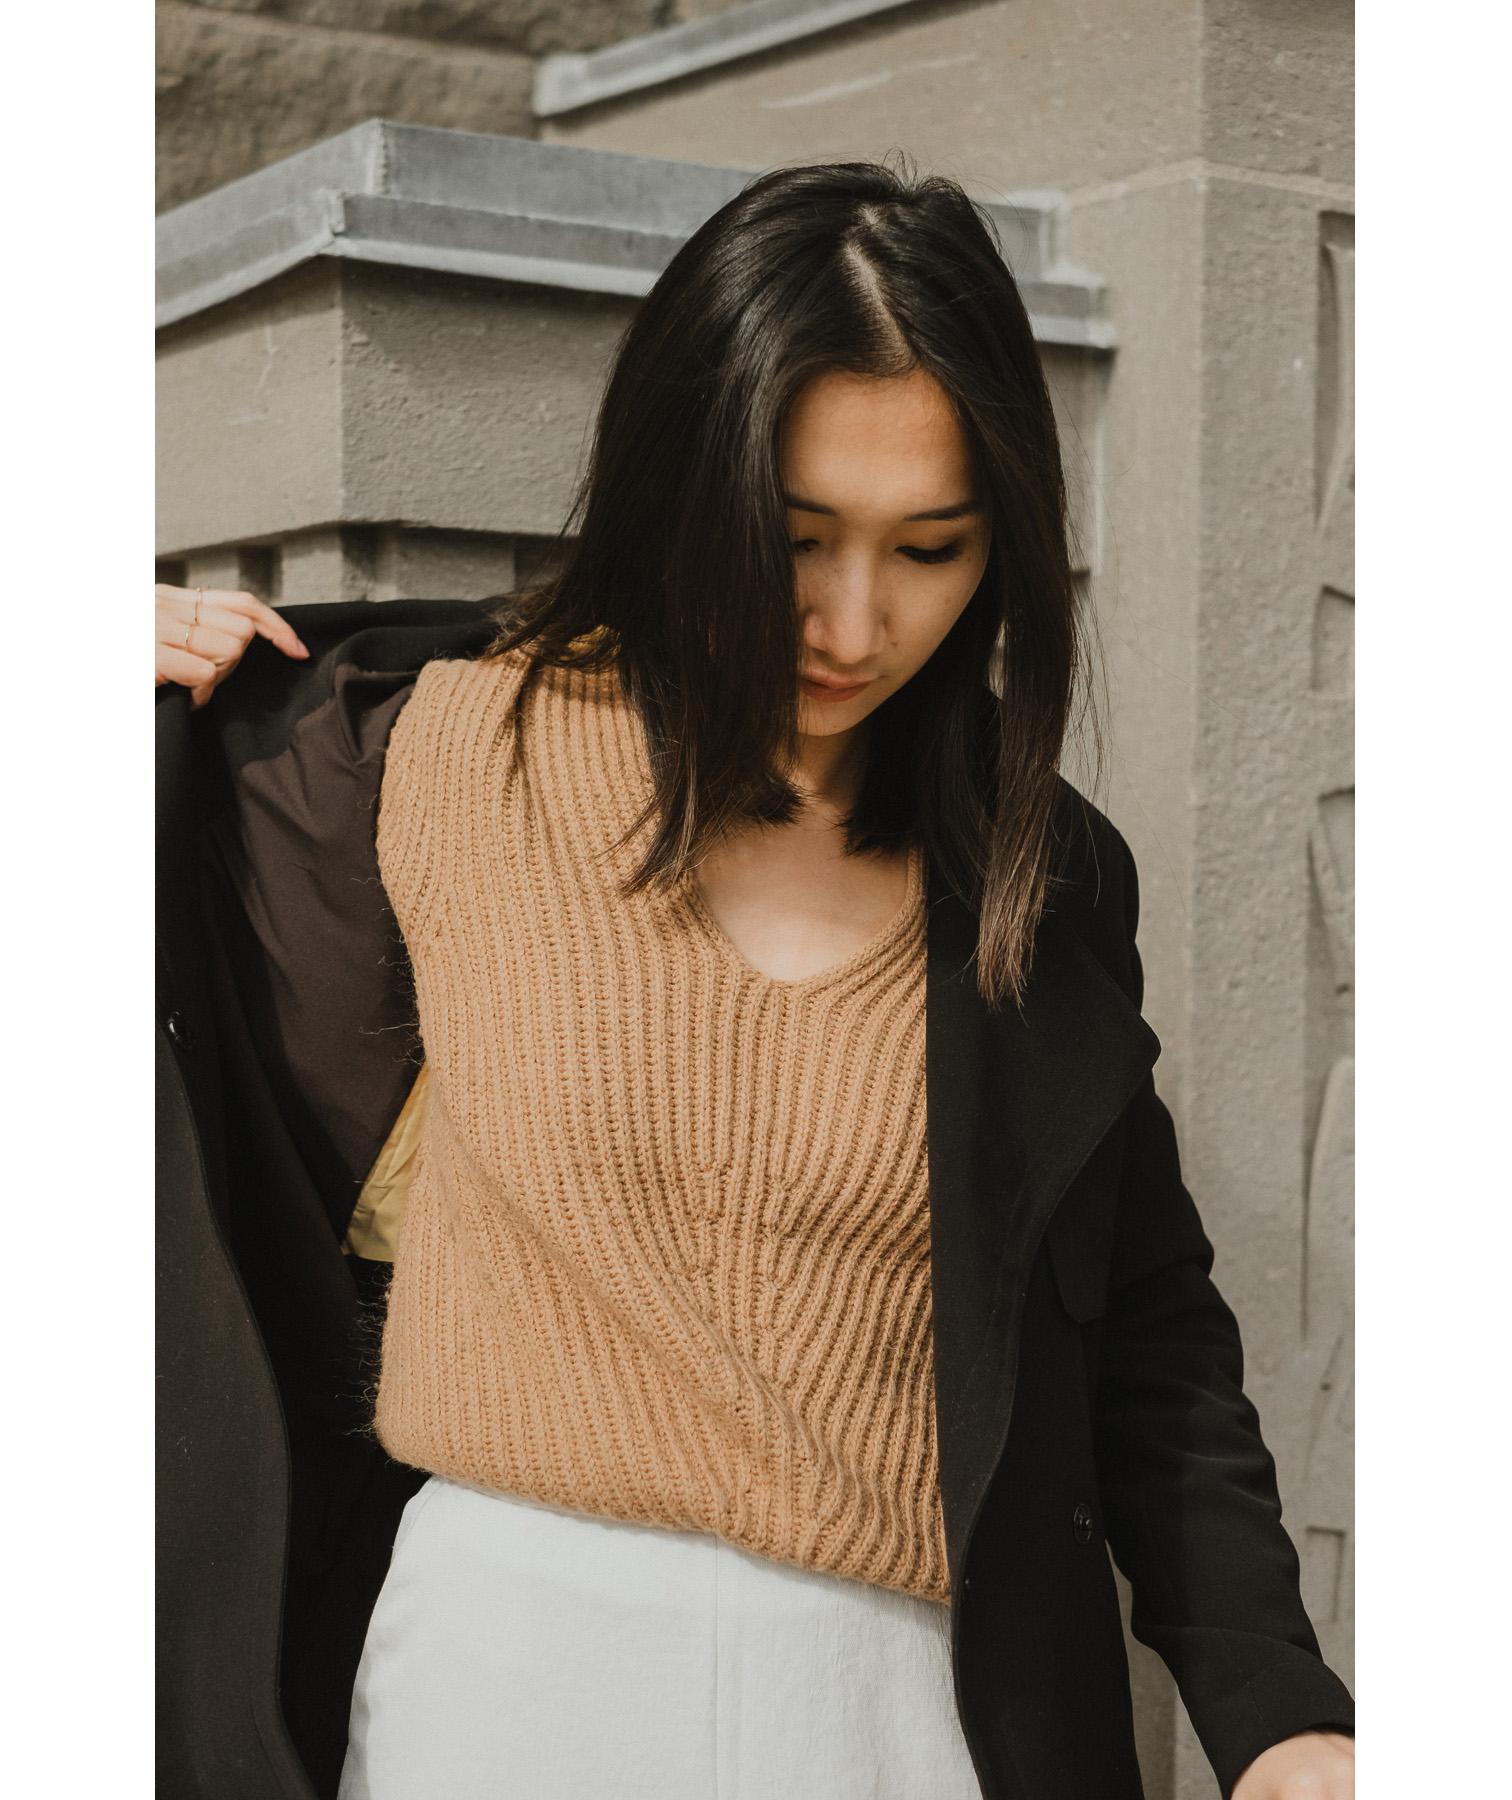 camel-cableknit-sweater